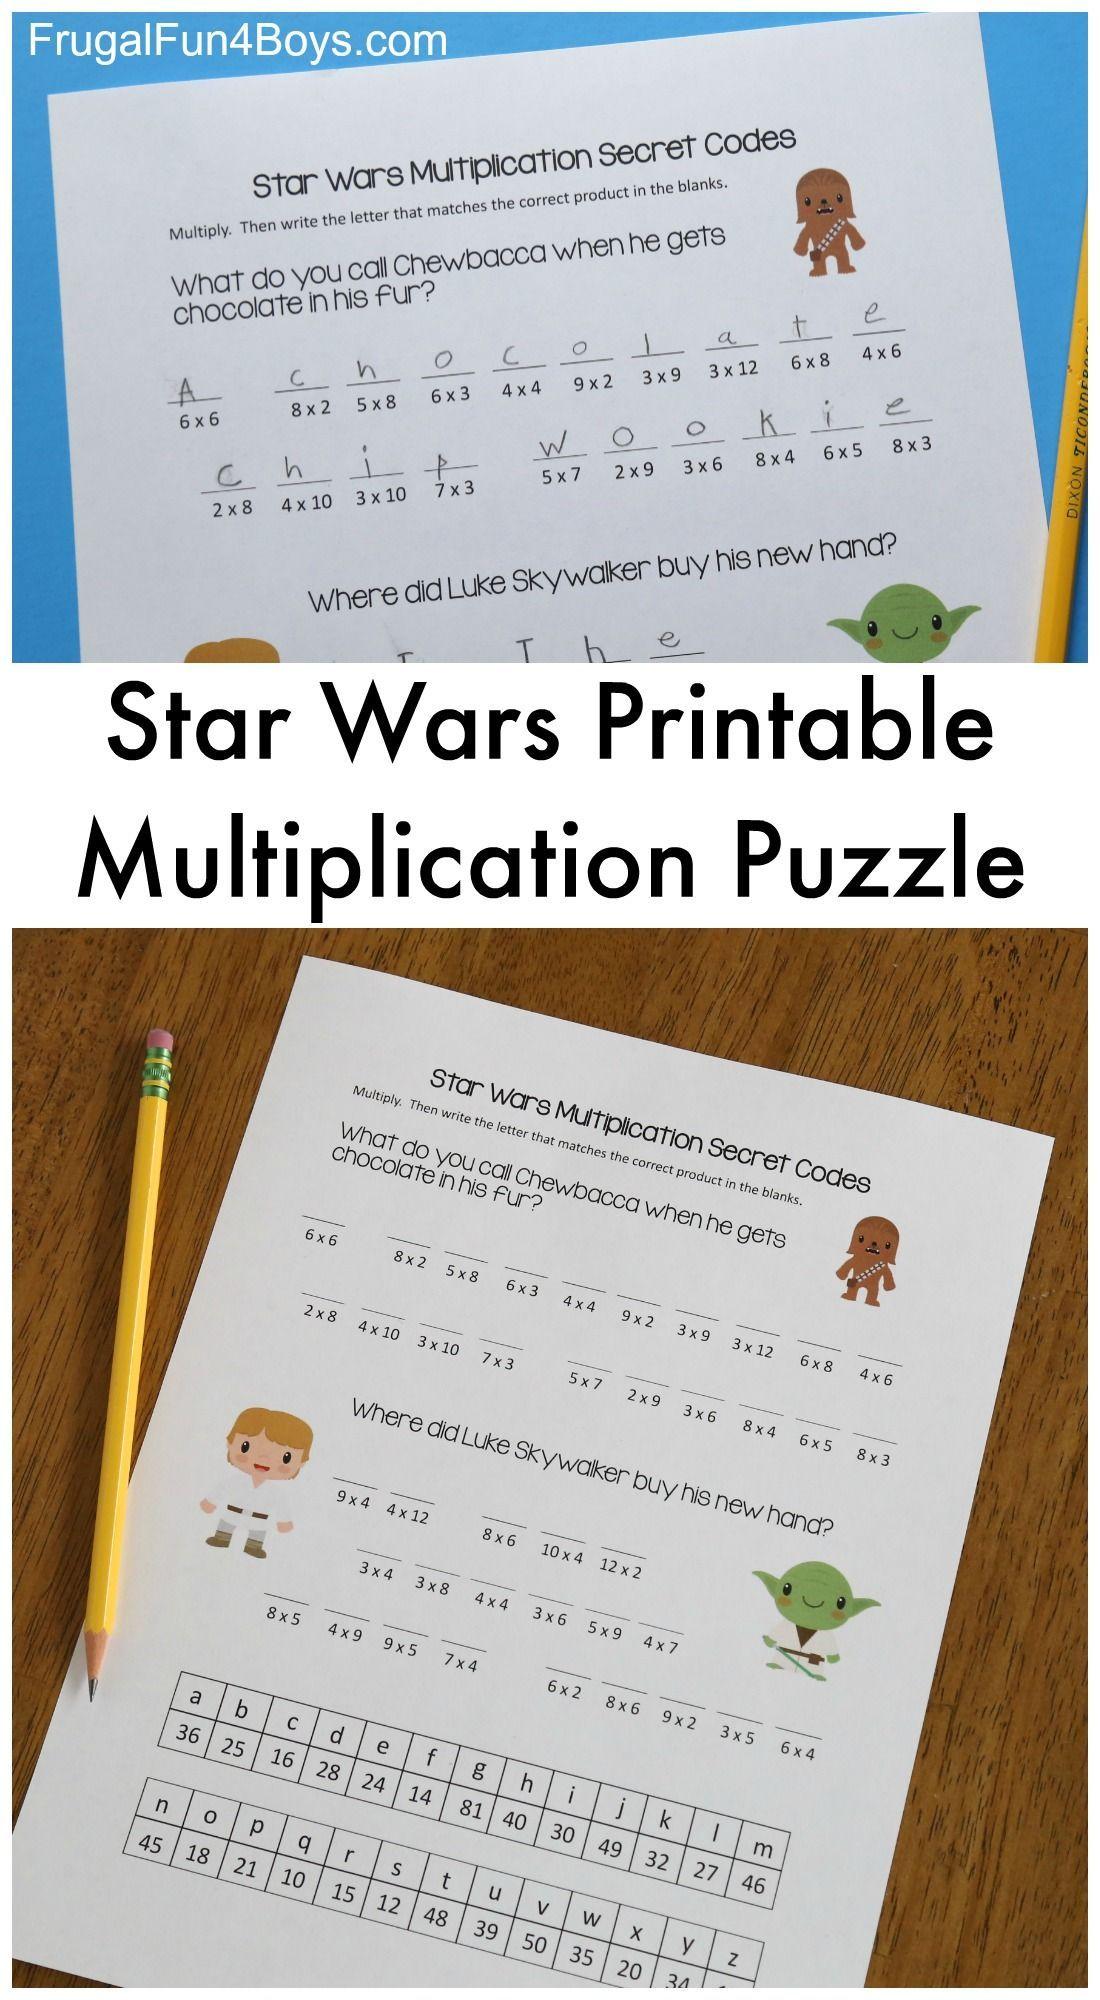 Star Wars Printable Multiplication Puzzle